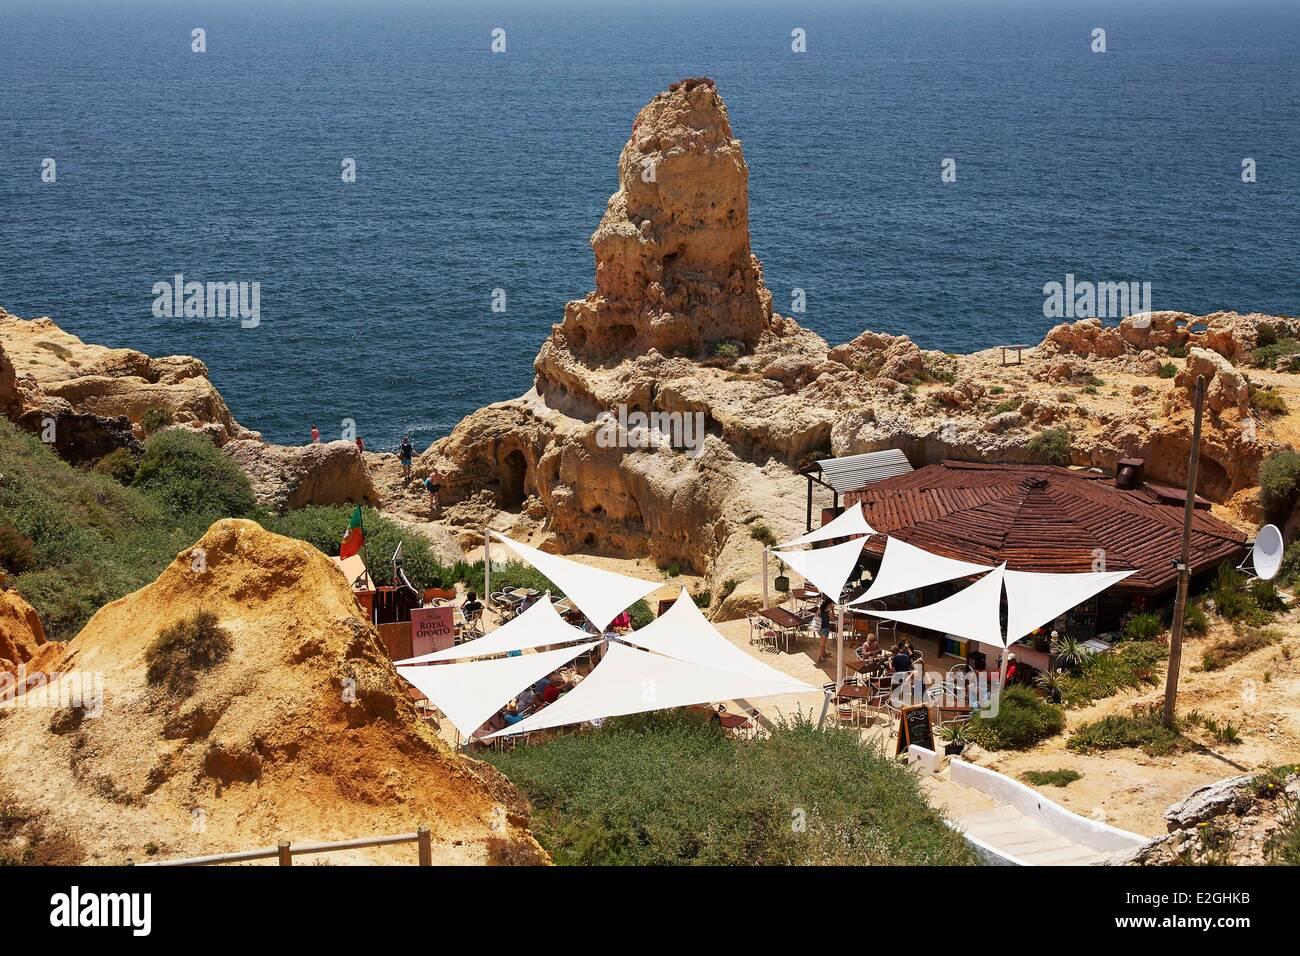 Portugal Algarve Carvoeiro Restaurant at edge of cliff Stock Photo